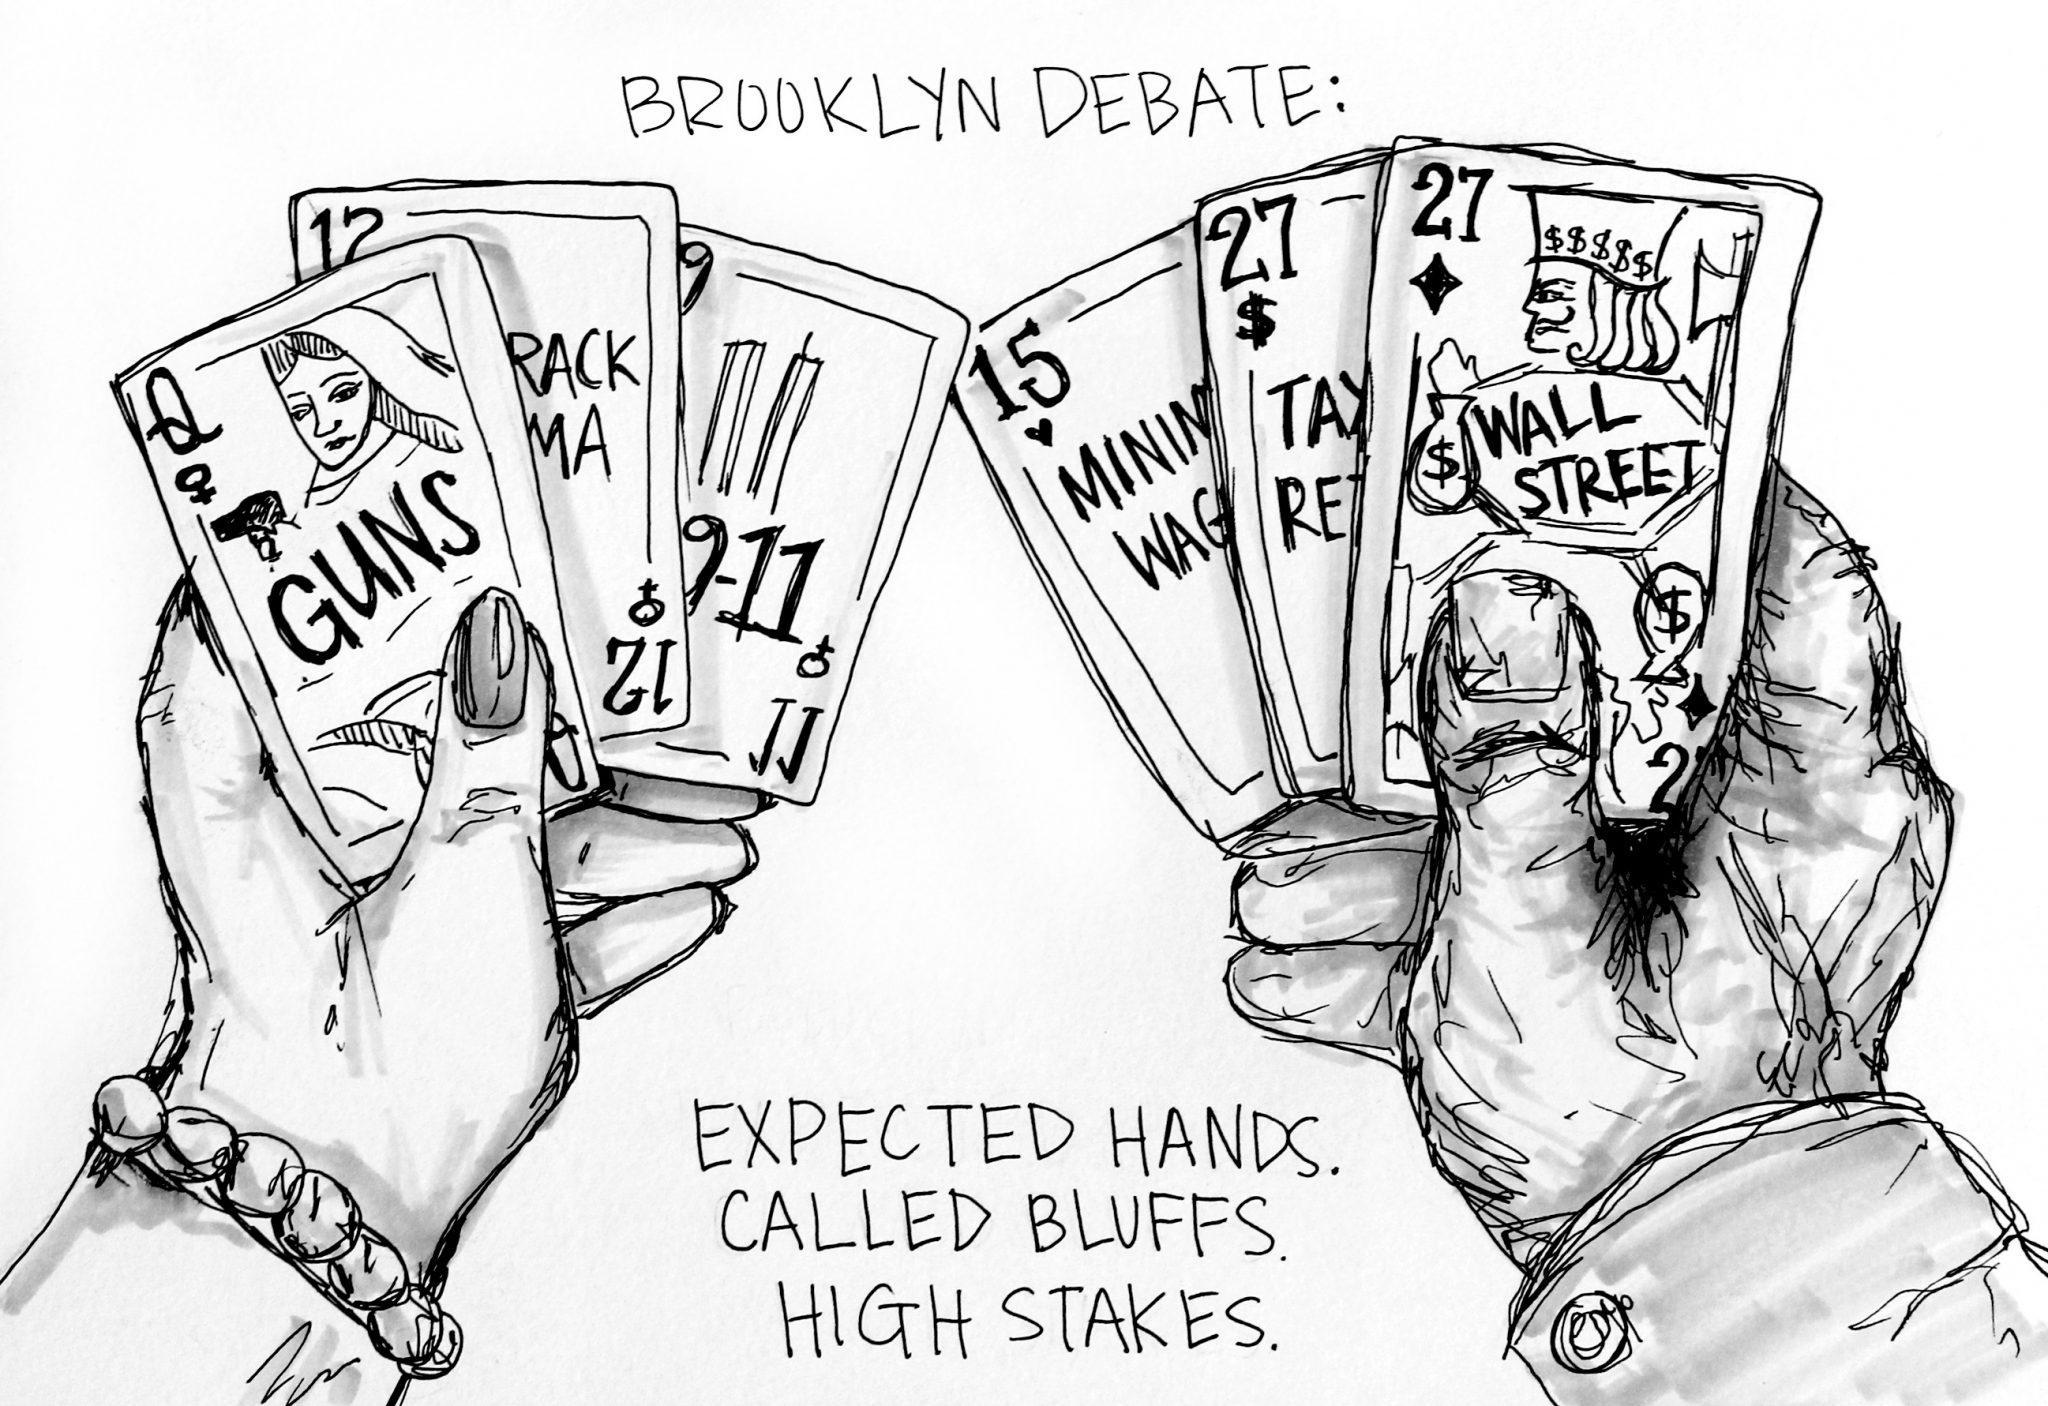 The+Brooklyn+Debate.+Cartoon+by+Emily+Howard.